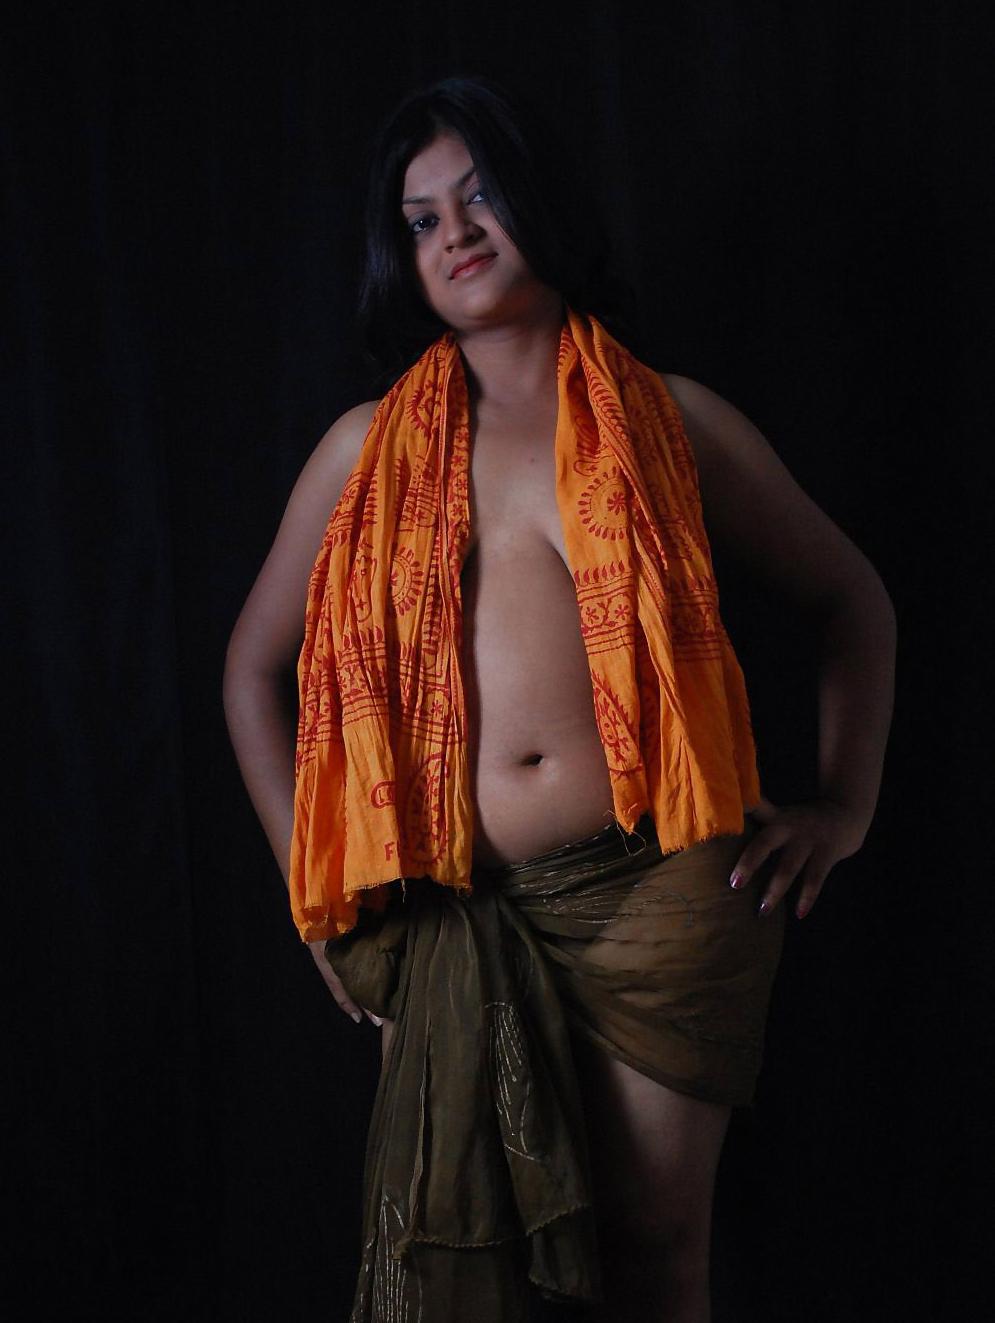 Super Girls 2014 Dusky Indian Model Art Nude Photos Hoot-8959